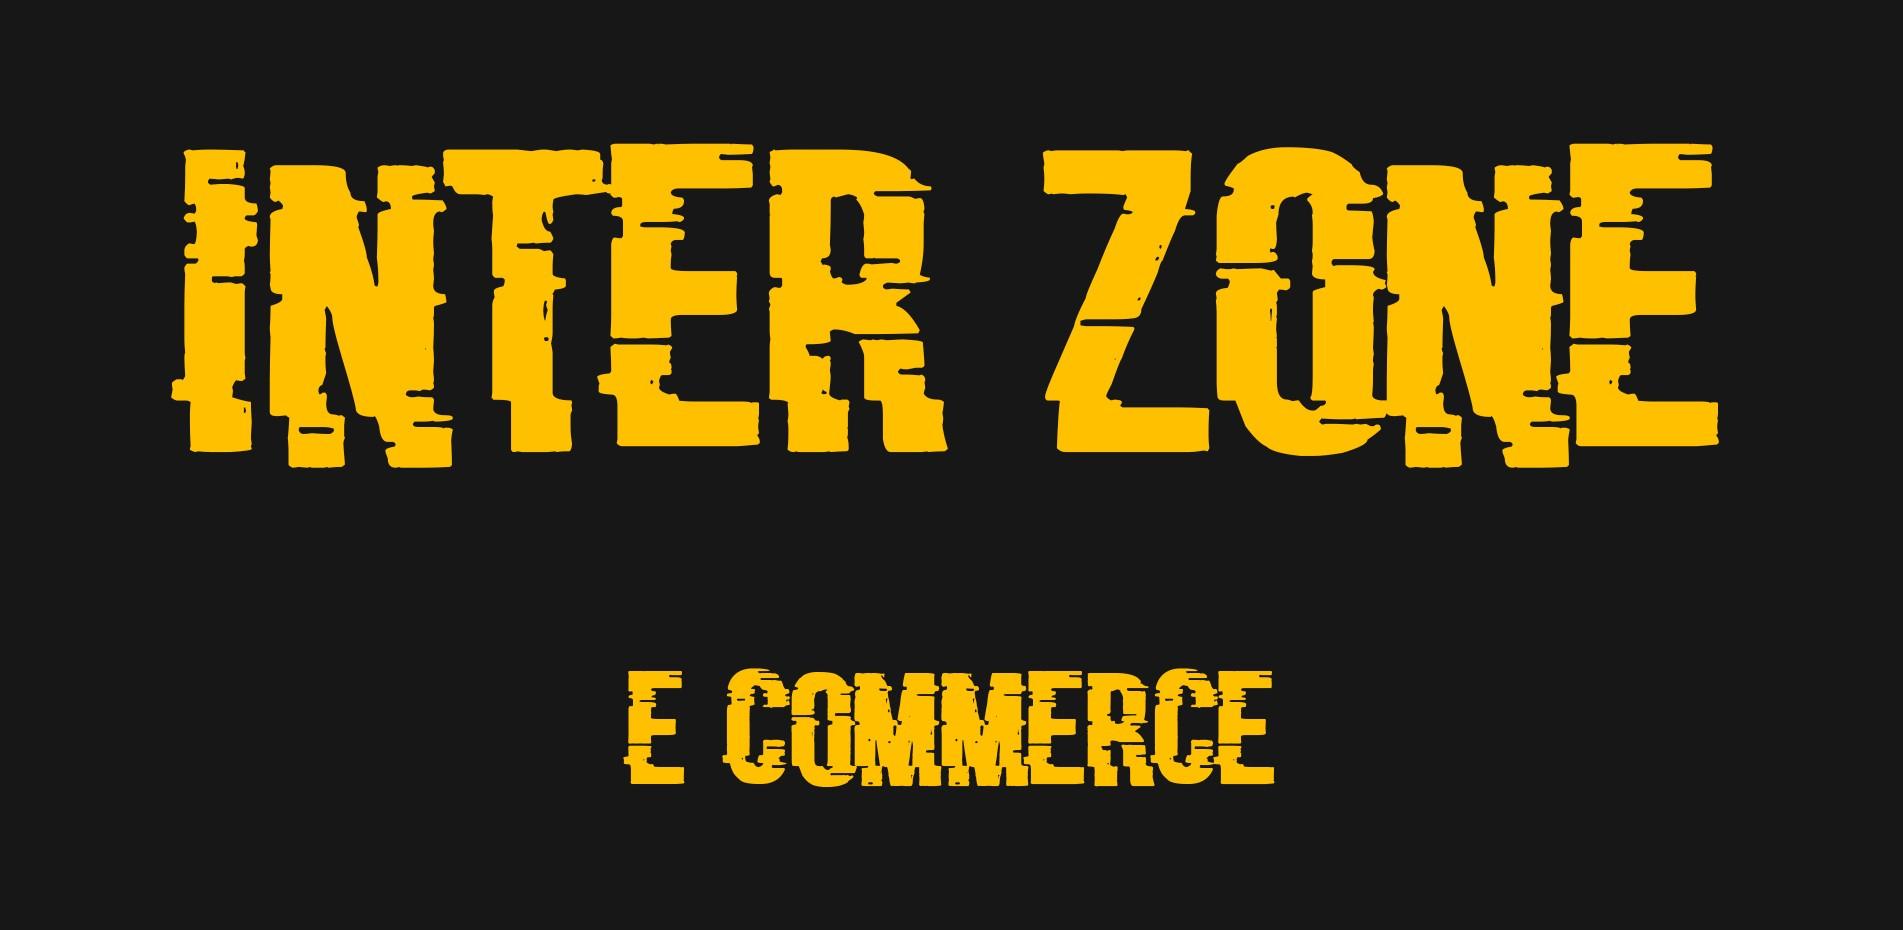 INTER ZONE - eCommerce